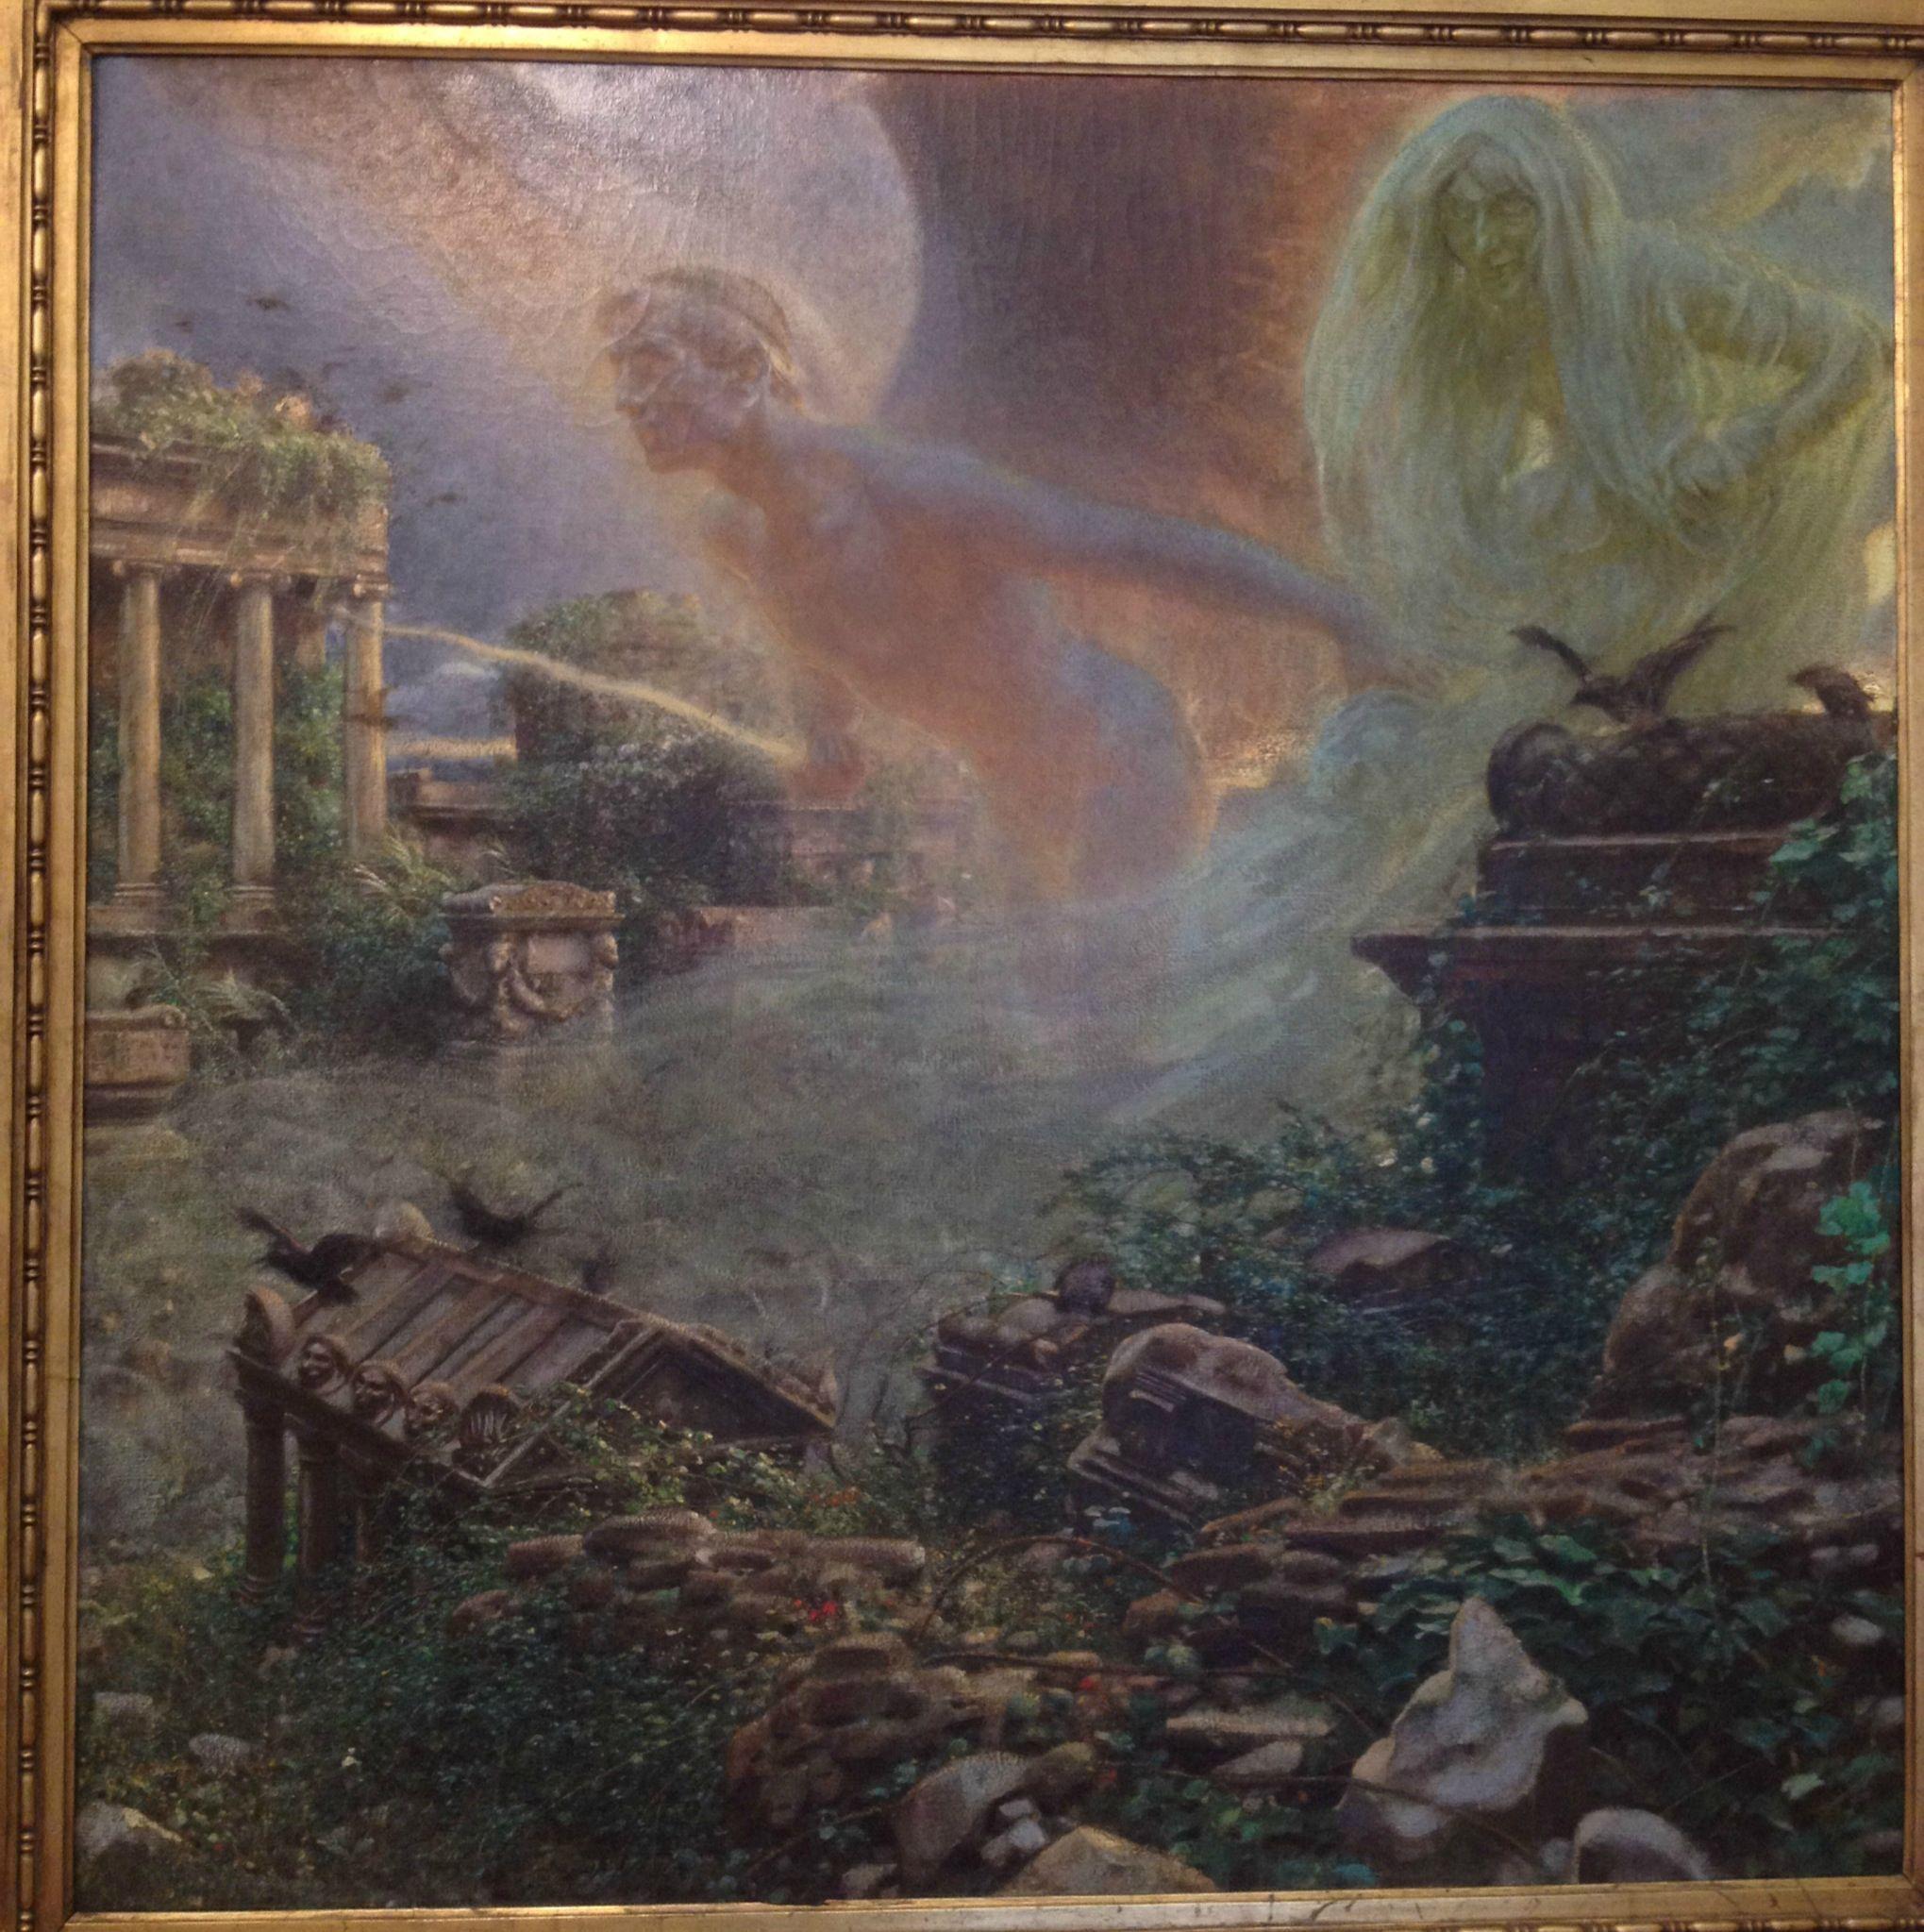 Adolf Hiremy Hirschl (1860-1933) 'Sic Transit...' | Fantastic art, History painting, Painting